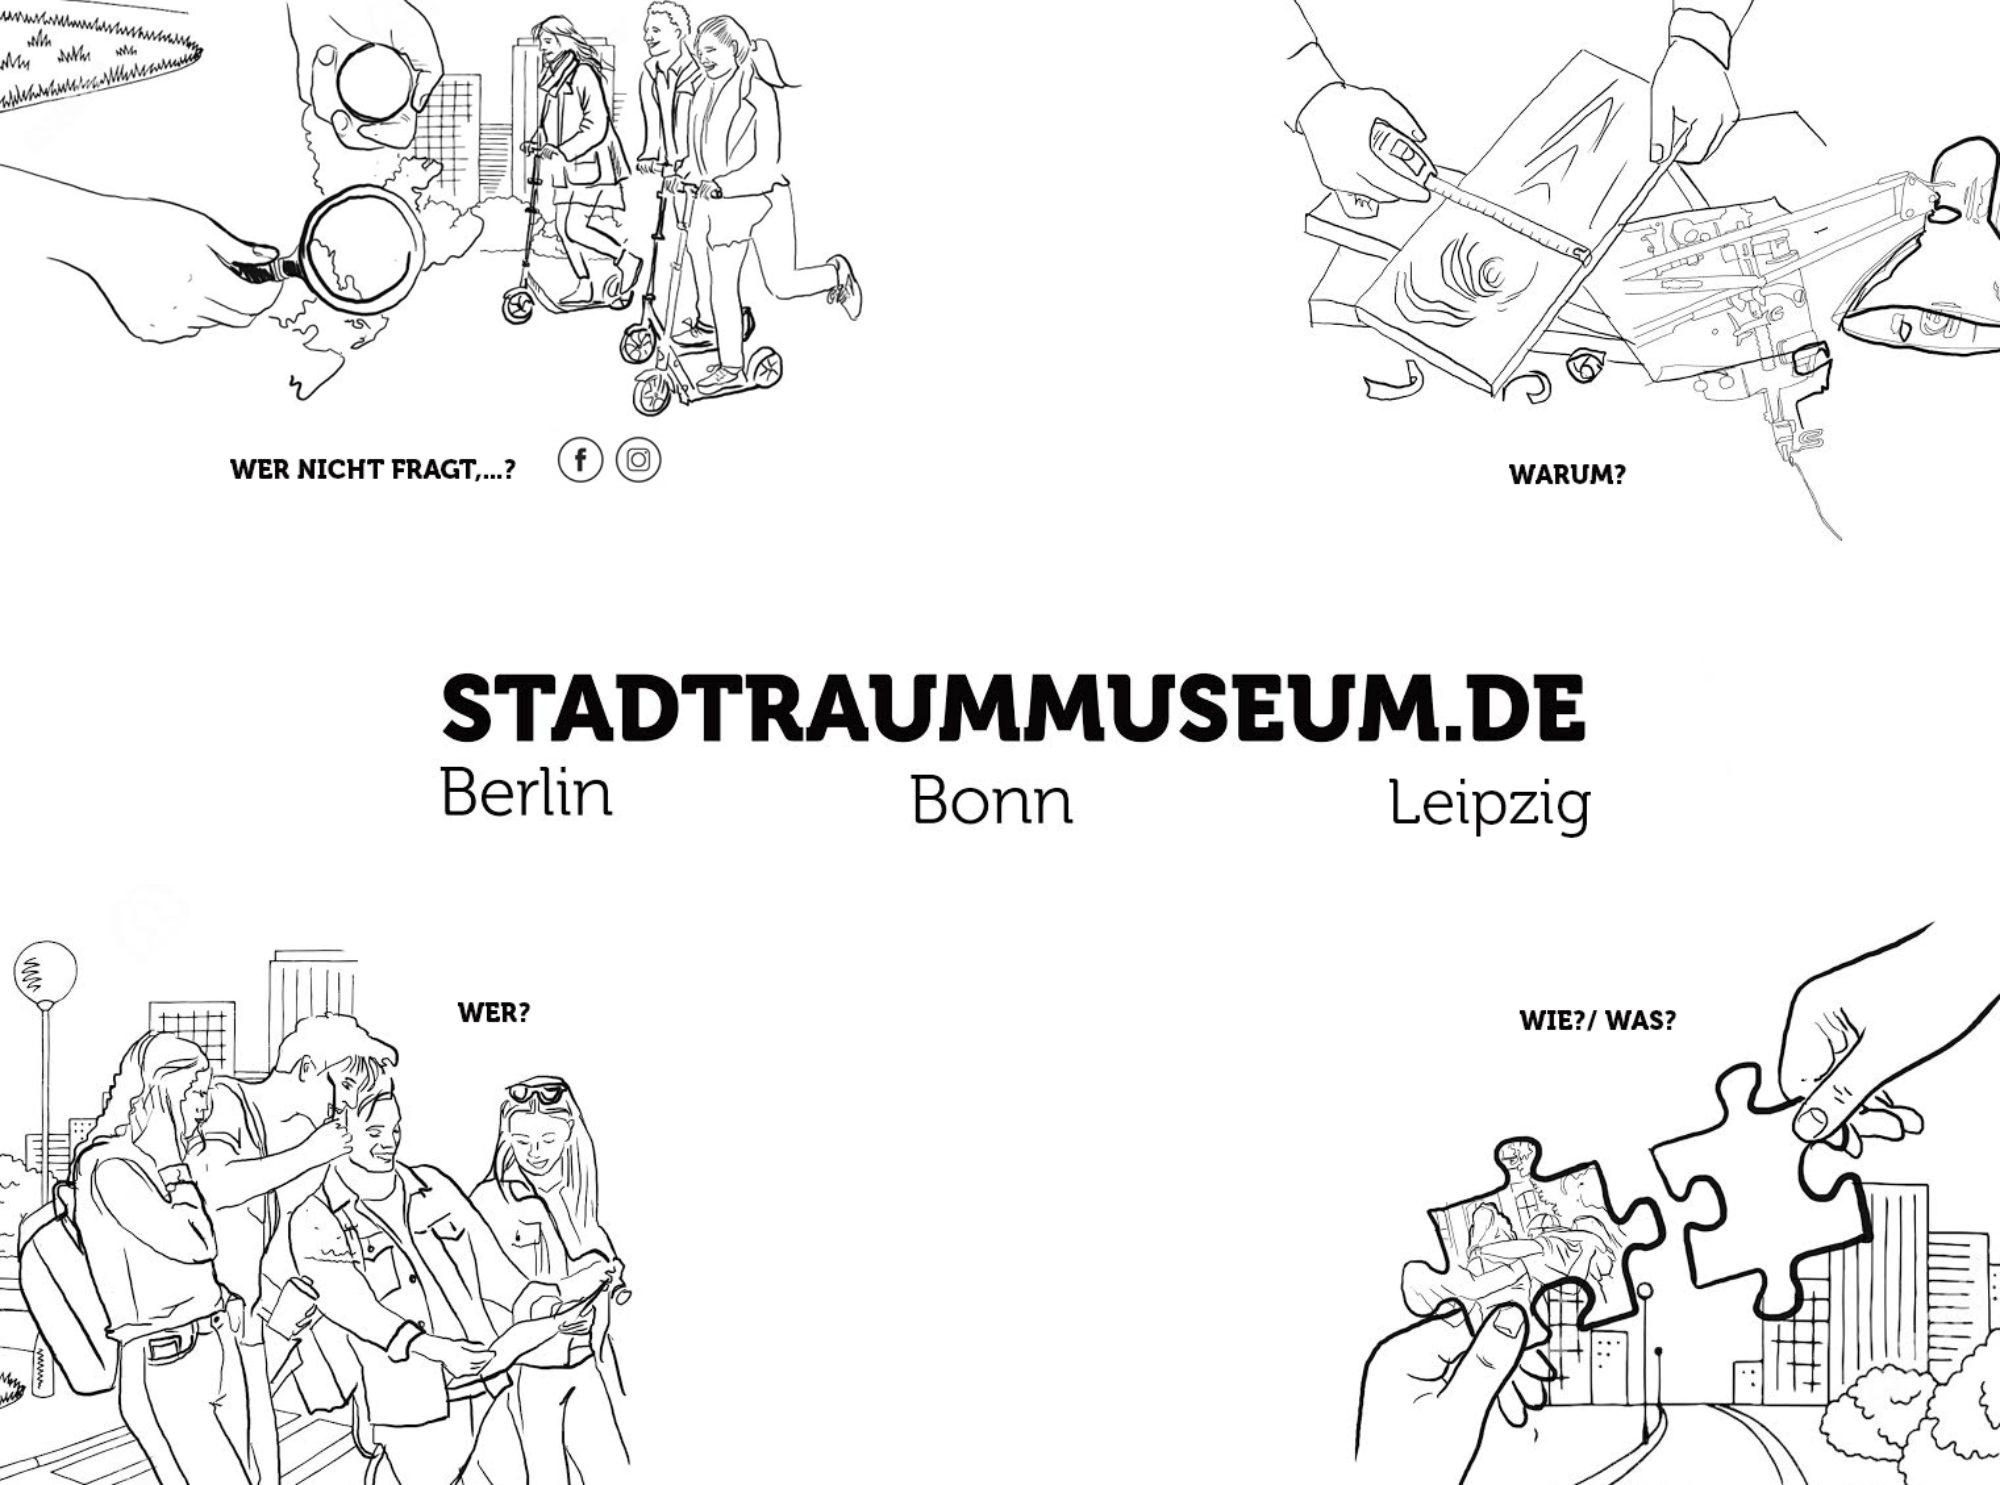 stadtraummuseum.de